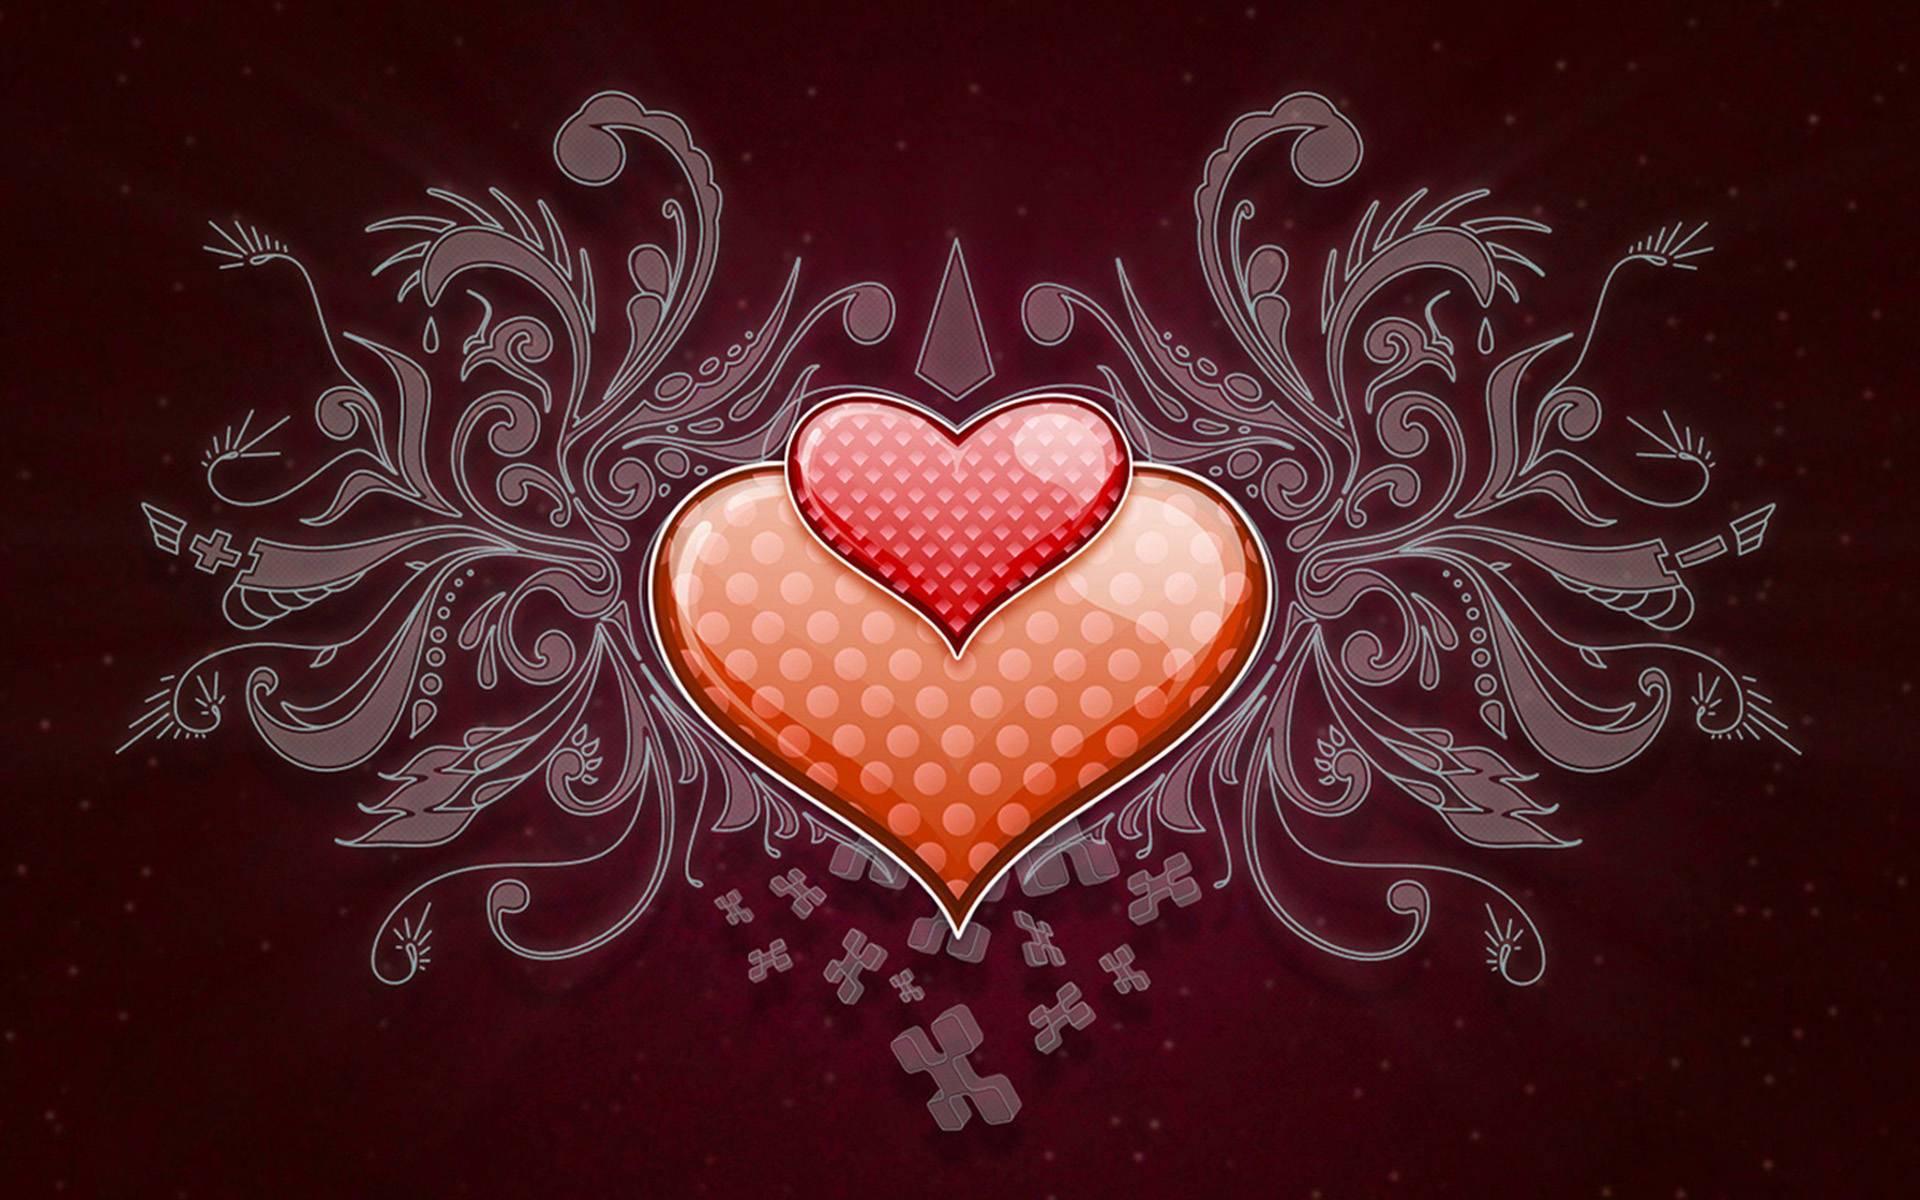 pretty heart designs wallpapers - photo #23